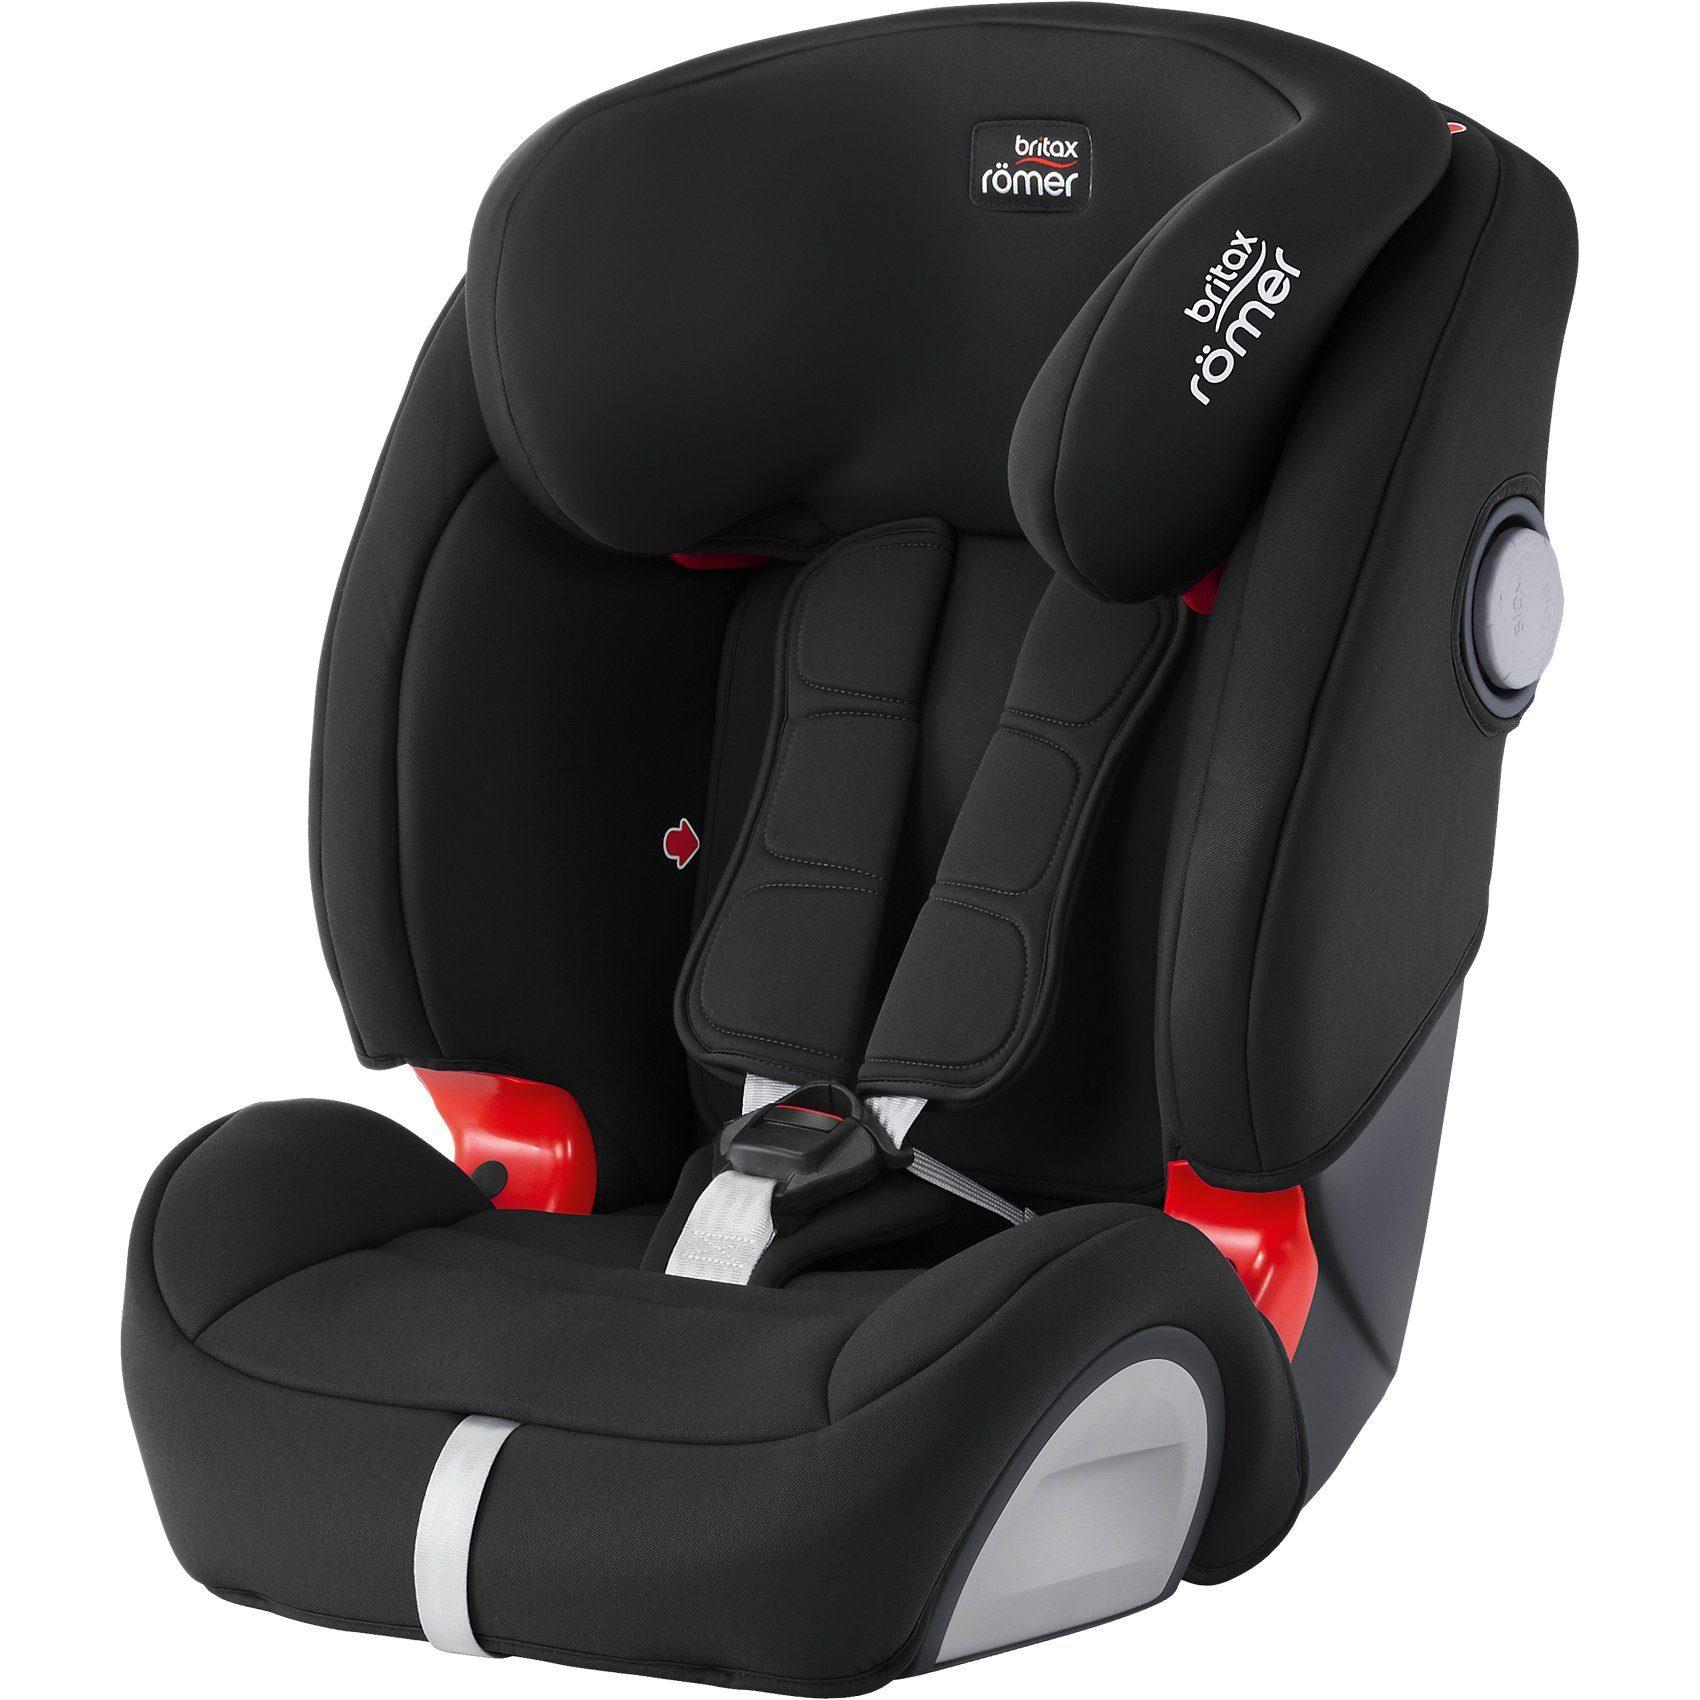 Britax Römer Auto-Kindersitz Evolva 1-2-3 SL SICT, Cosmos Black, 2018